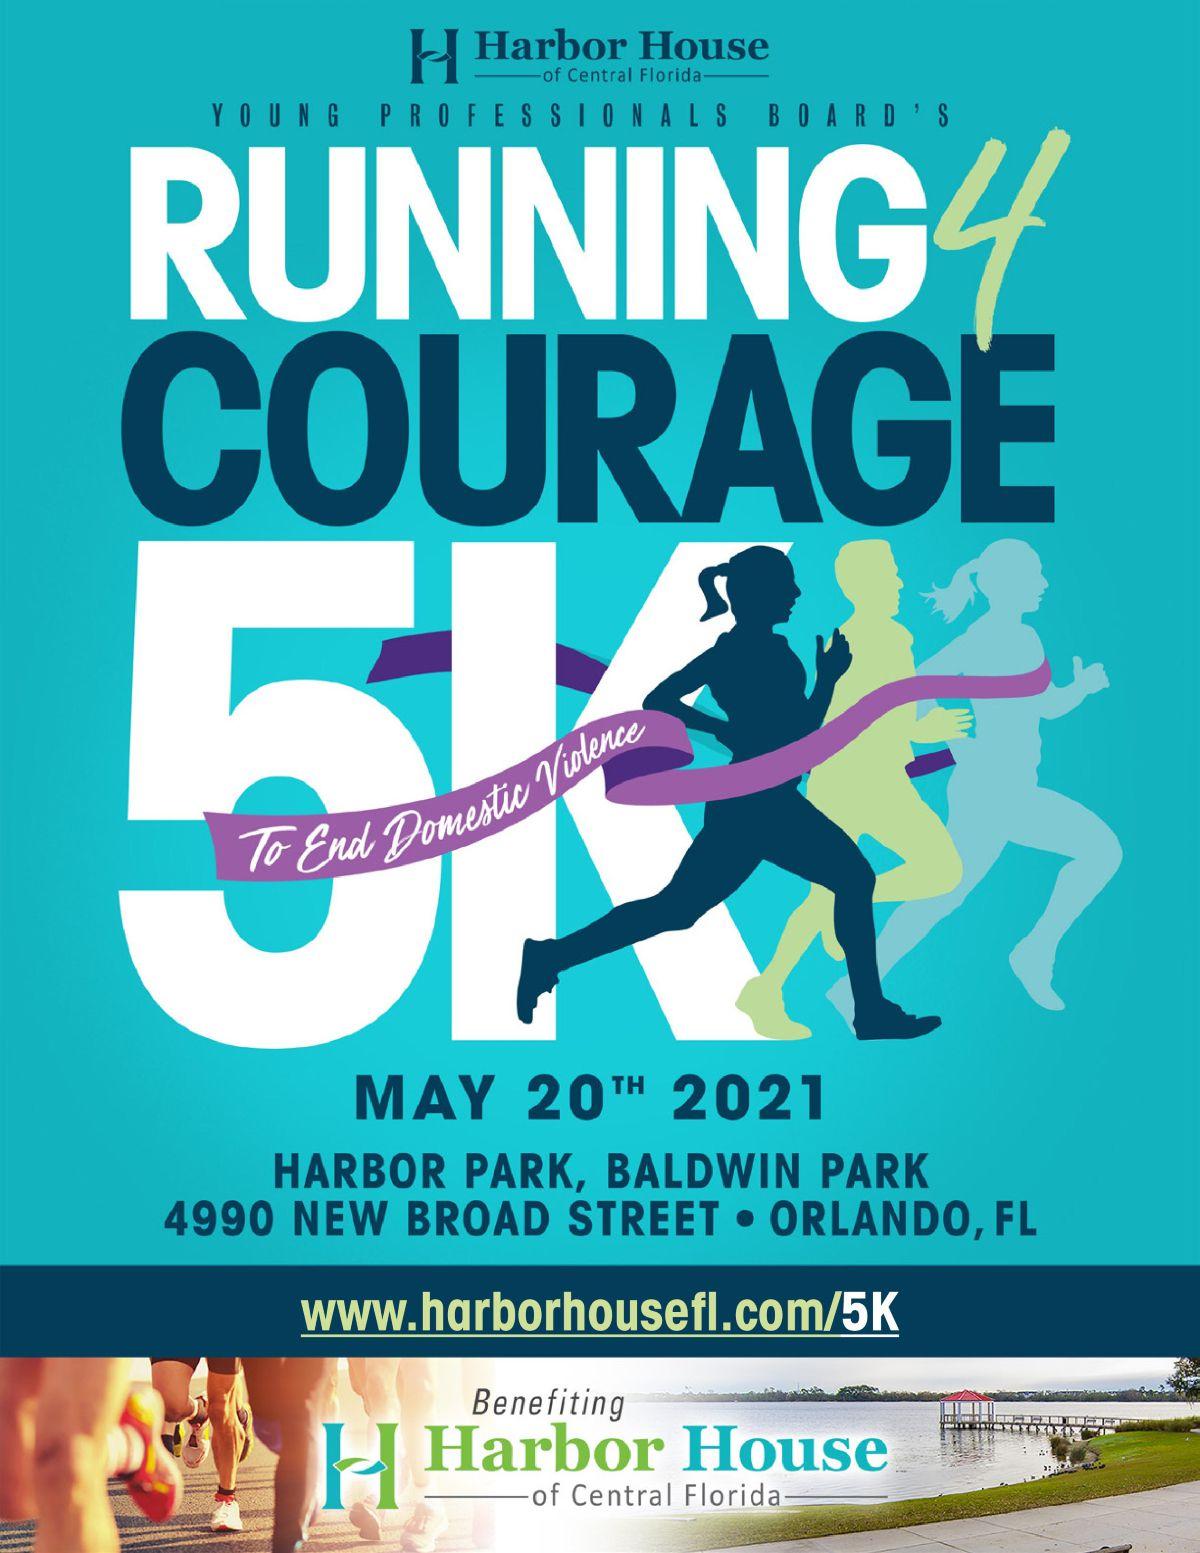 Running 4 Courage 5K